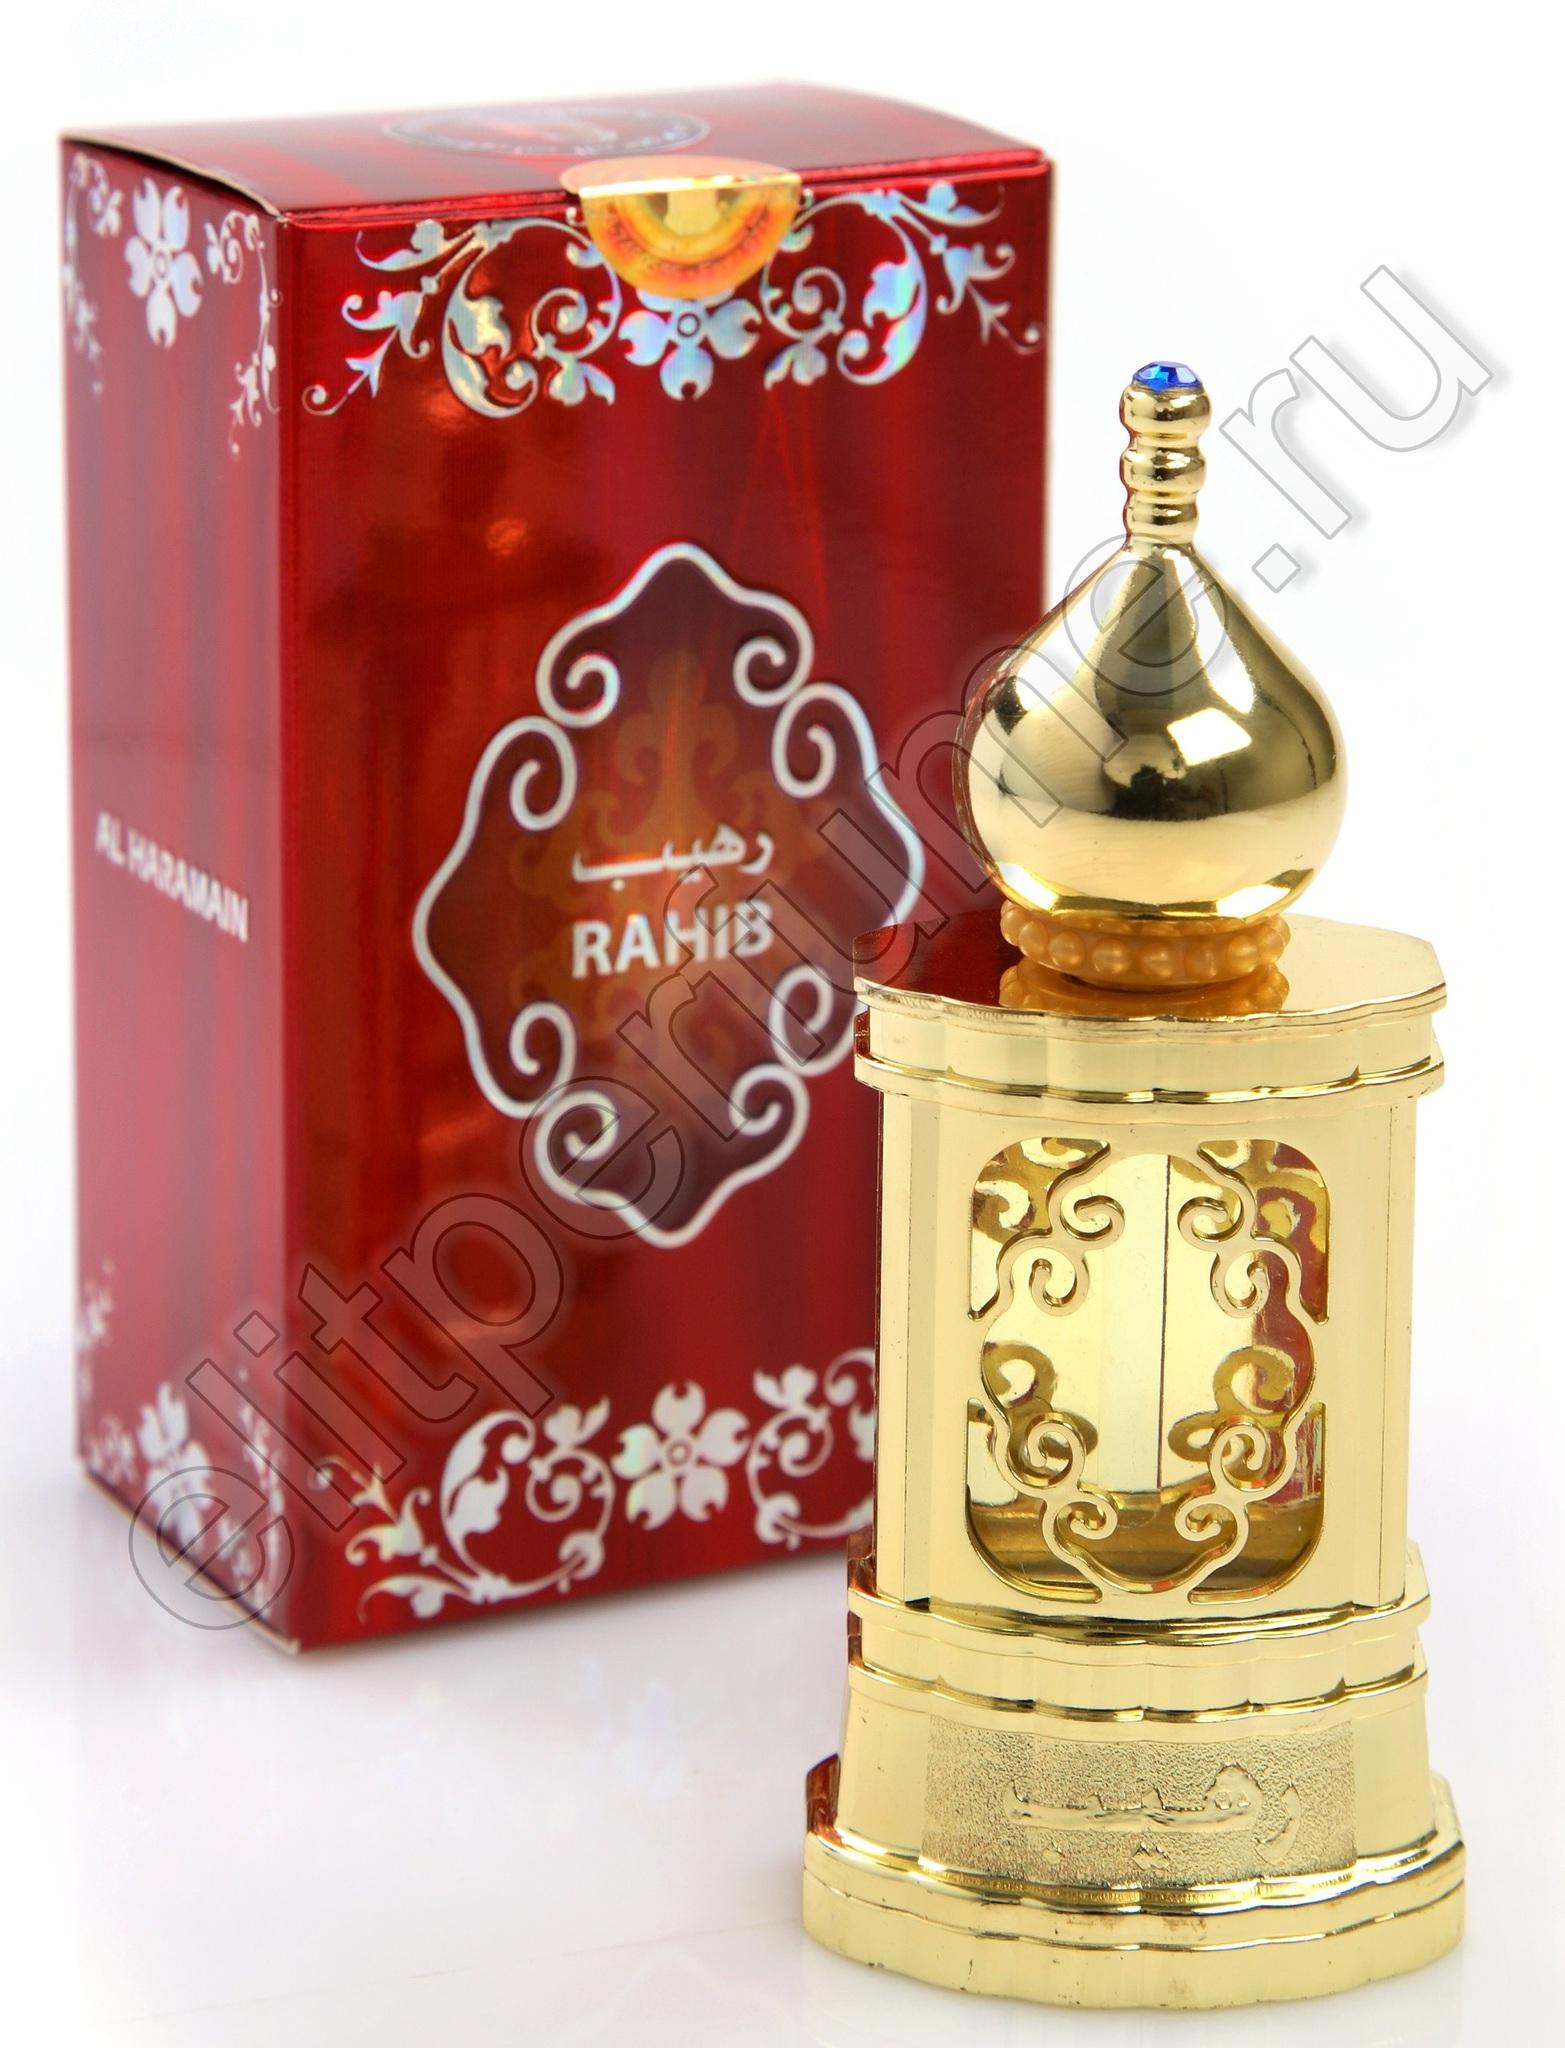 Рахиб Rahib 15 мл арабские масляные духи от Аль Харамайн Al Haramain Perfumes